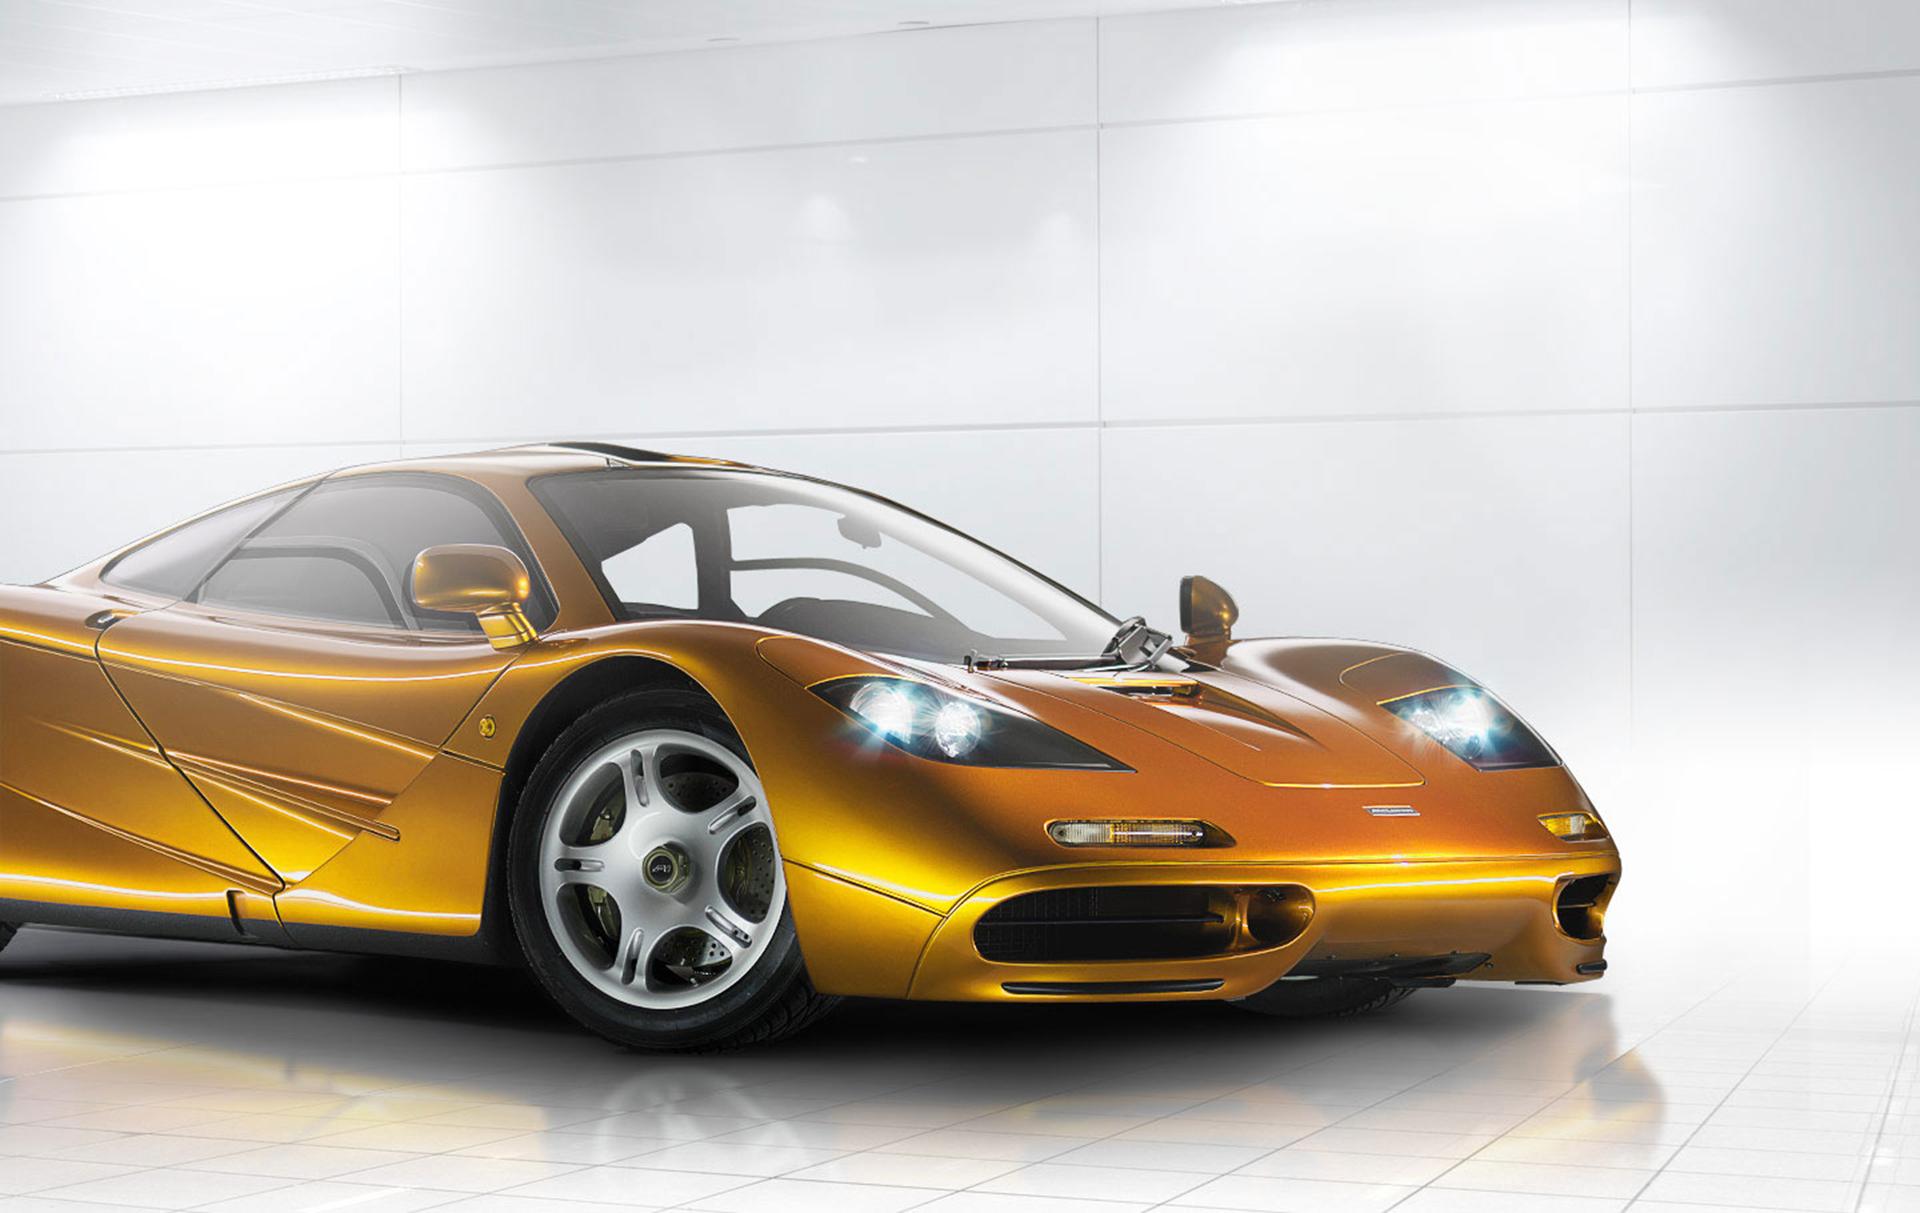 McLaren F1 - front light